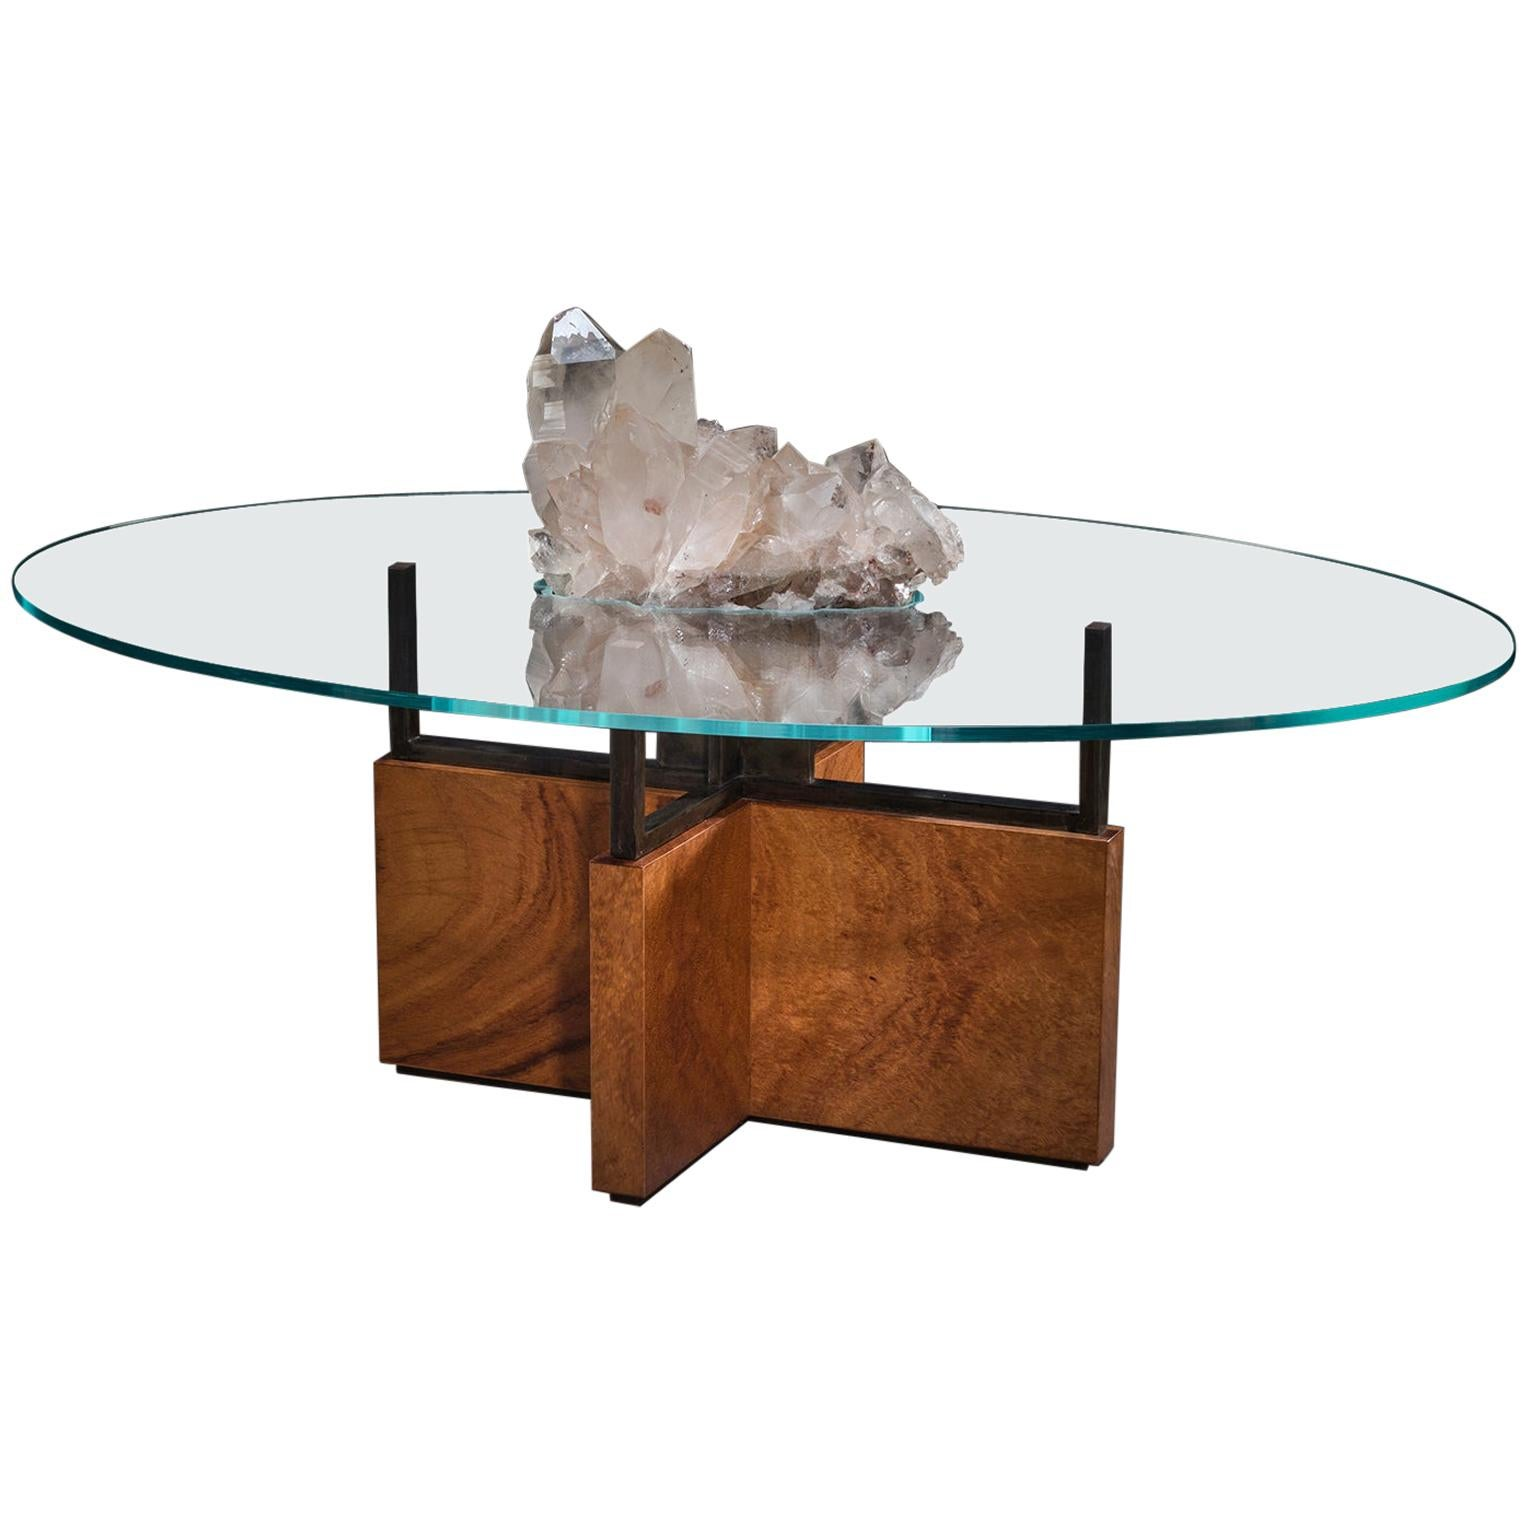 Studio Greytak 'Iceberg Table 6' Himalayan Quartz, Solid Bronze, Monkey Pod Wood